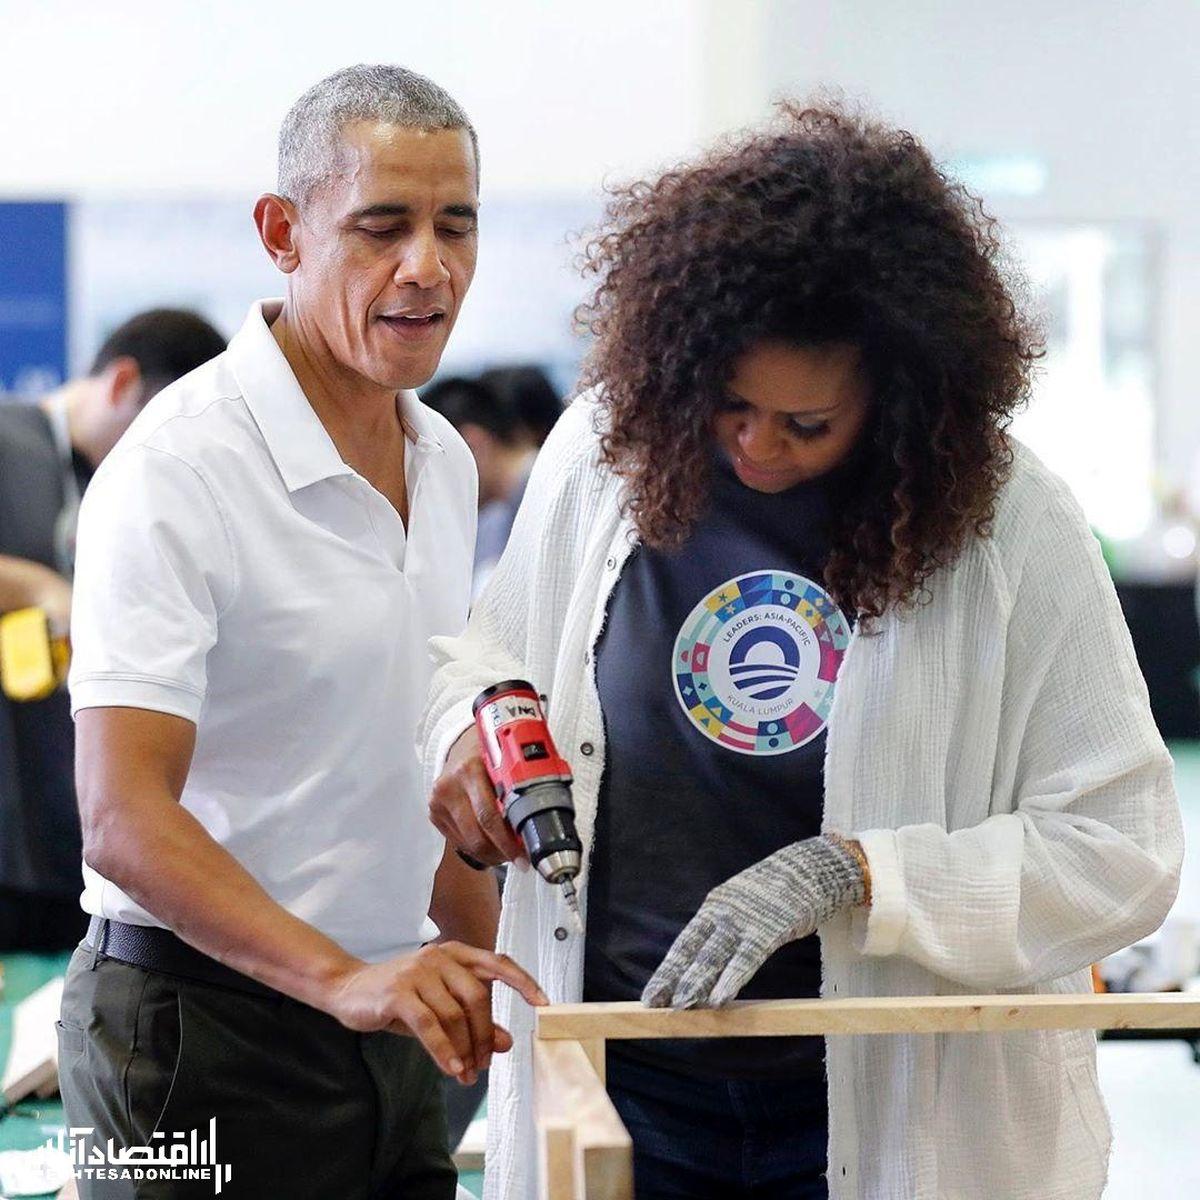 نجاری کردن میشل اوباما! +عکس